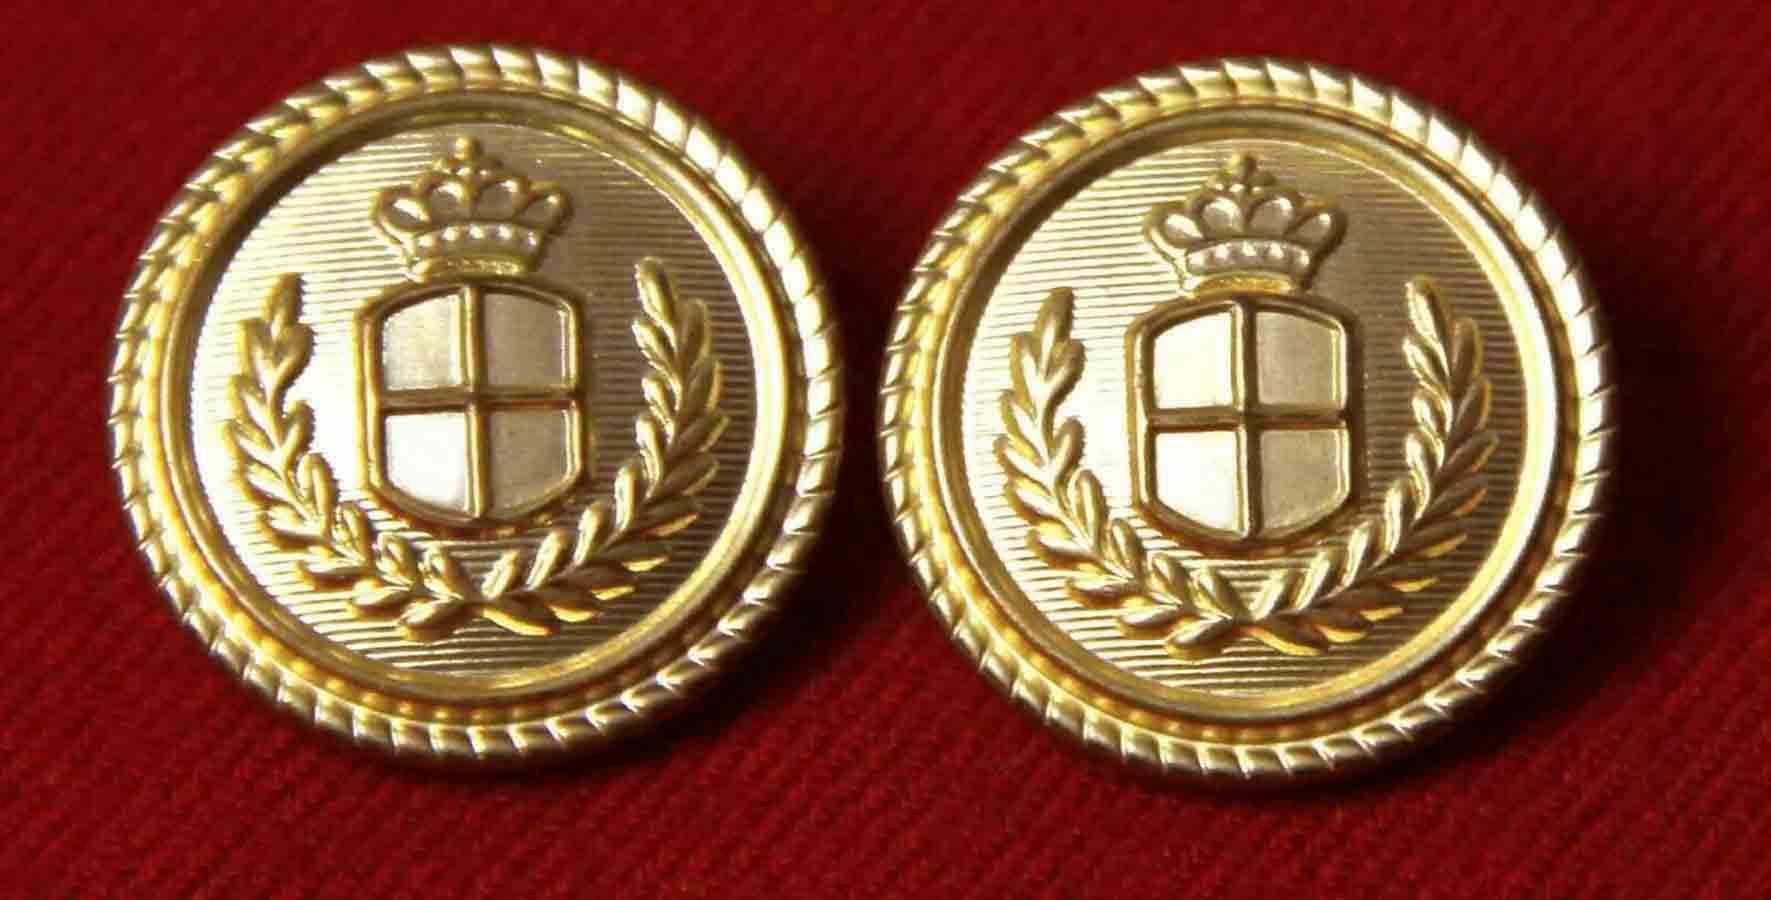 Two Vintage Waterbury Blazer Buttons Gold Brass Shank Crown Shield Laurel Men's 7/8